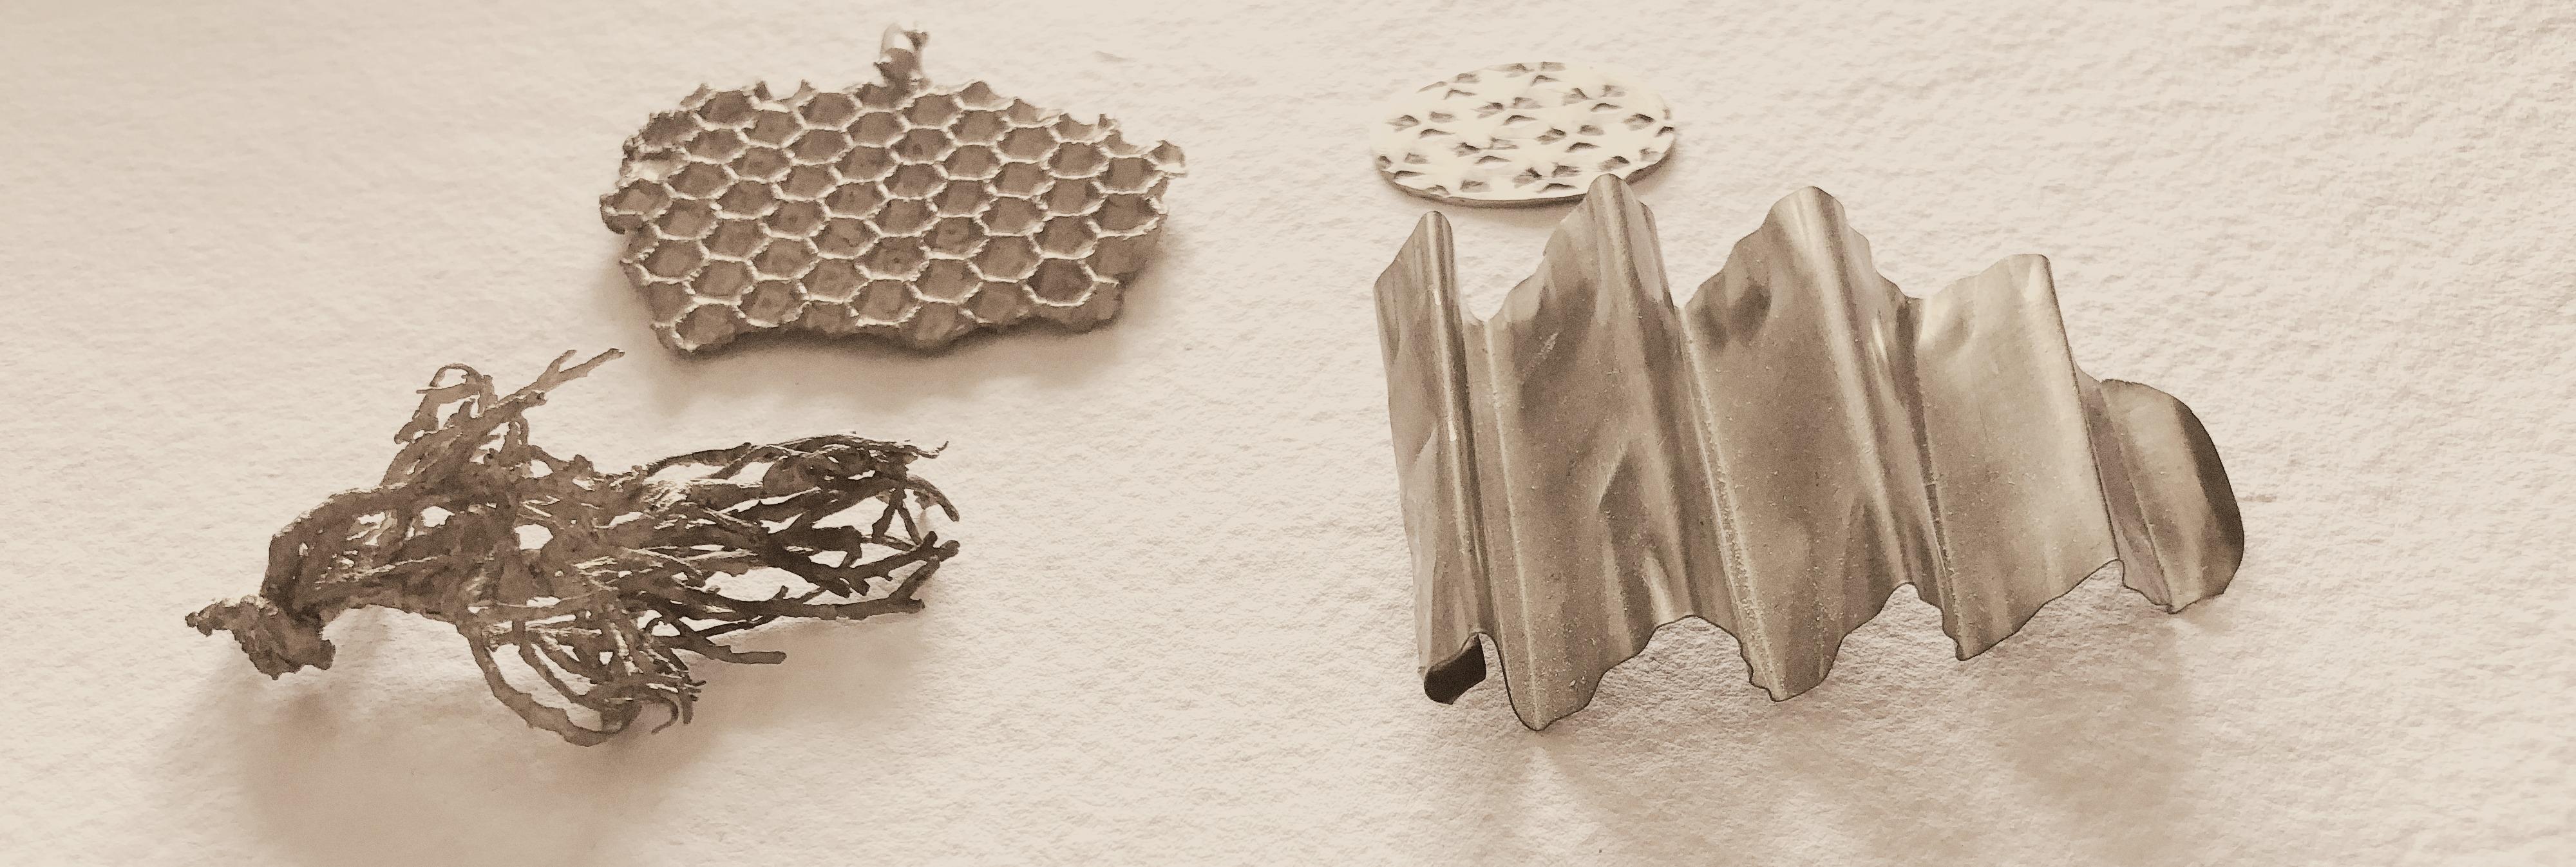 Joyas de plata contemporaneas